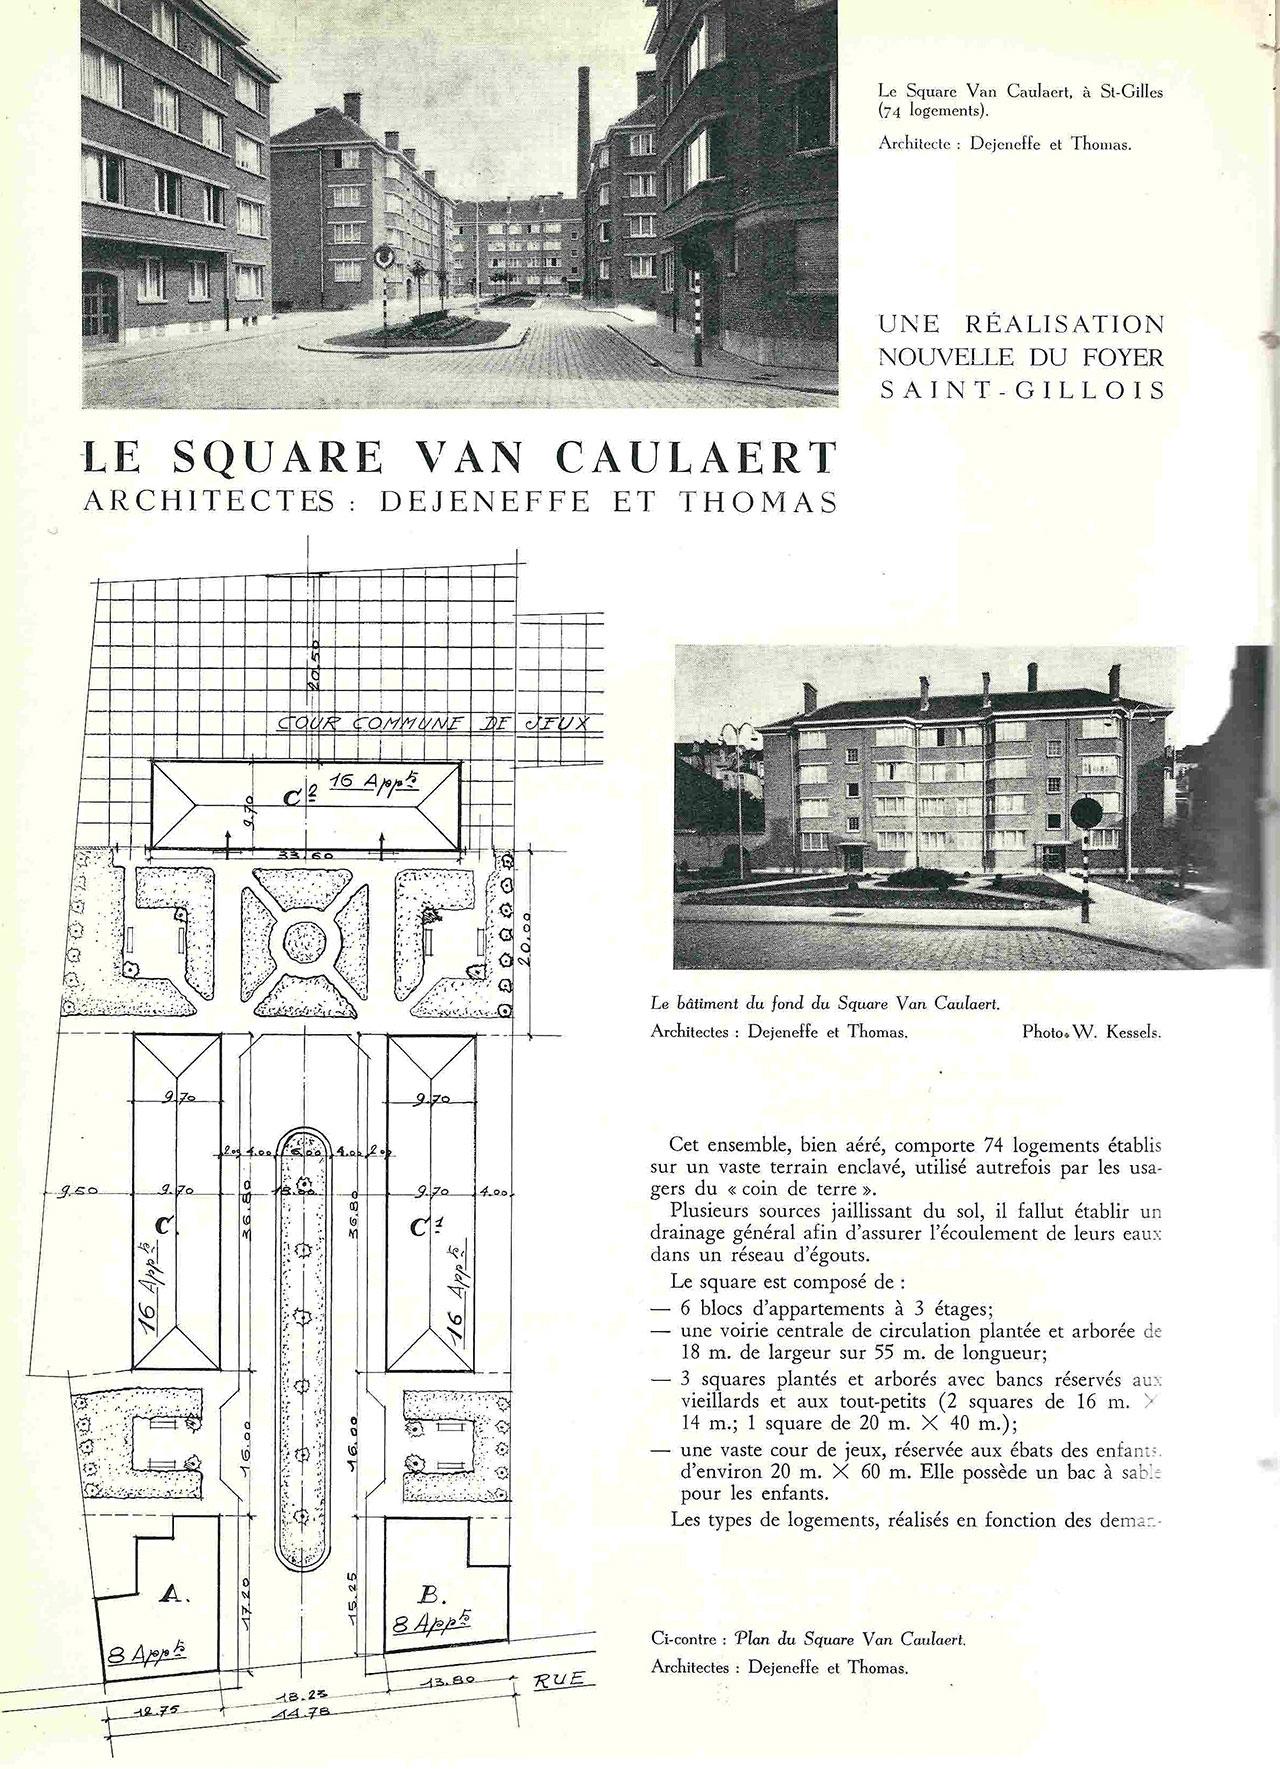 Le Square Van Caulaert